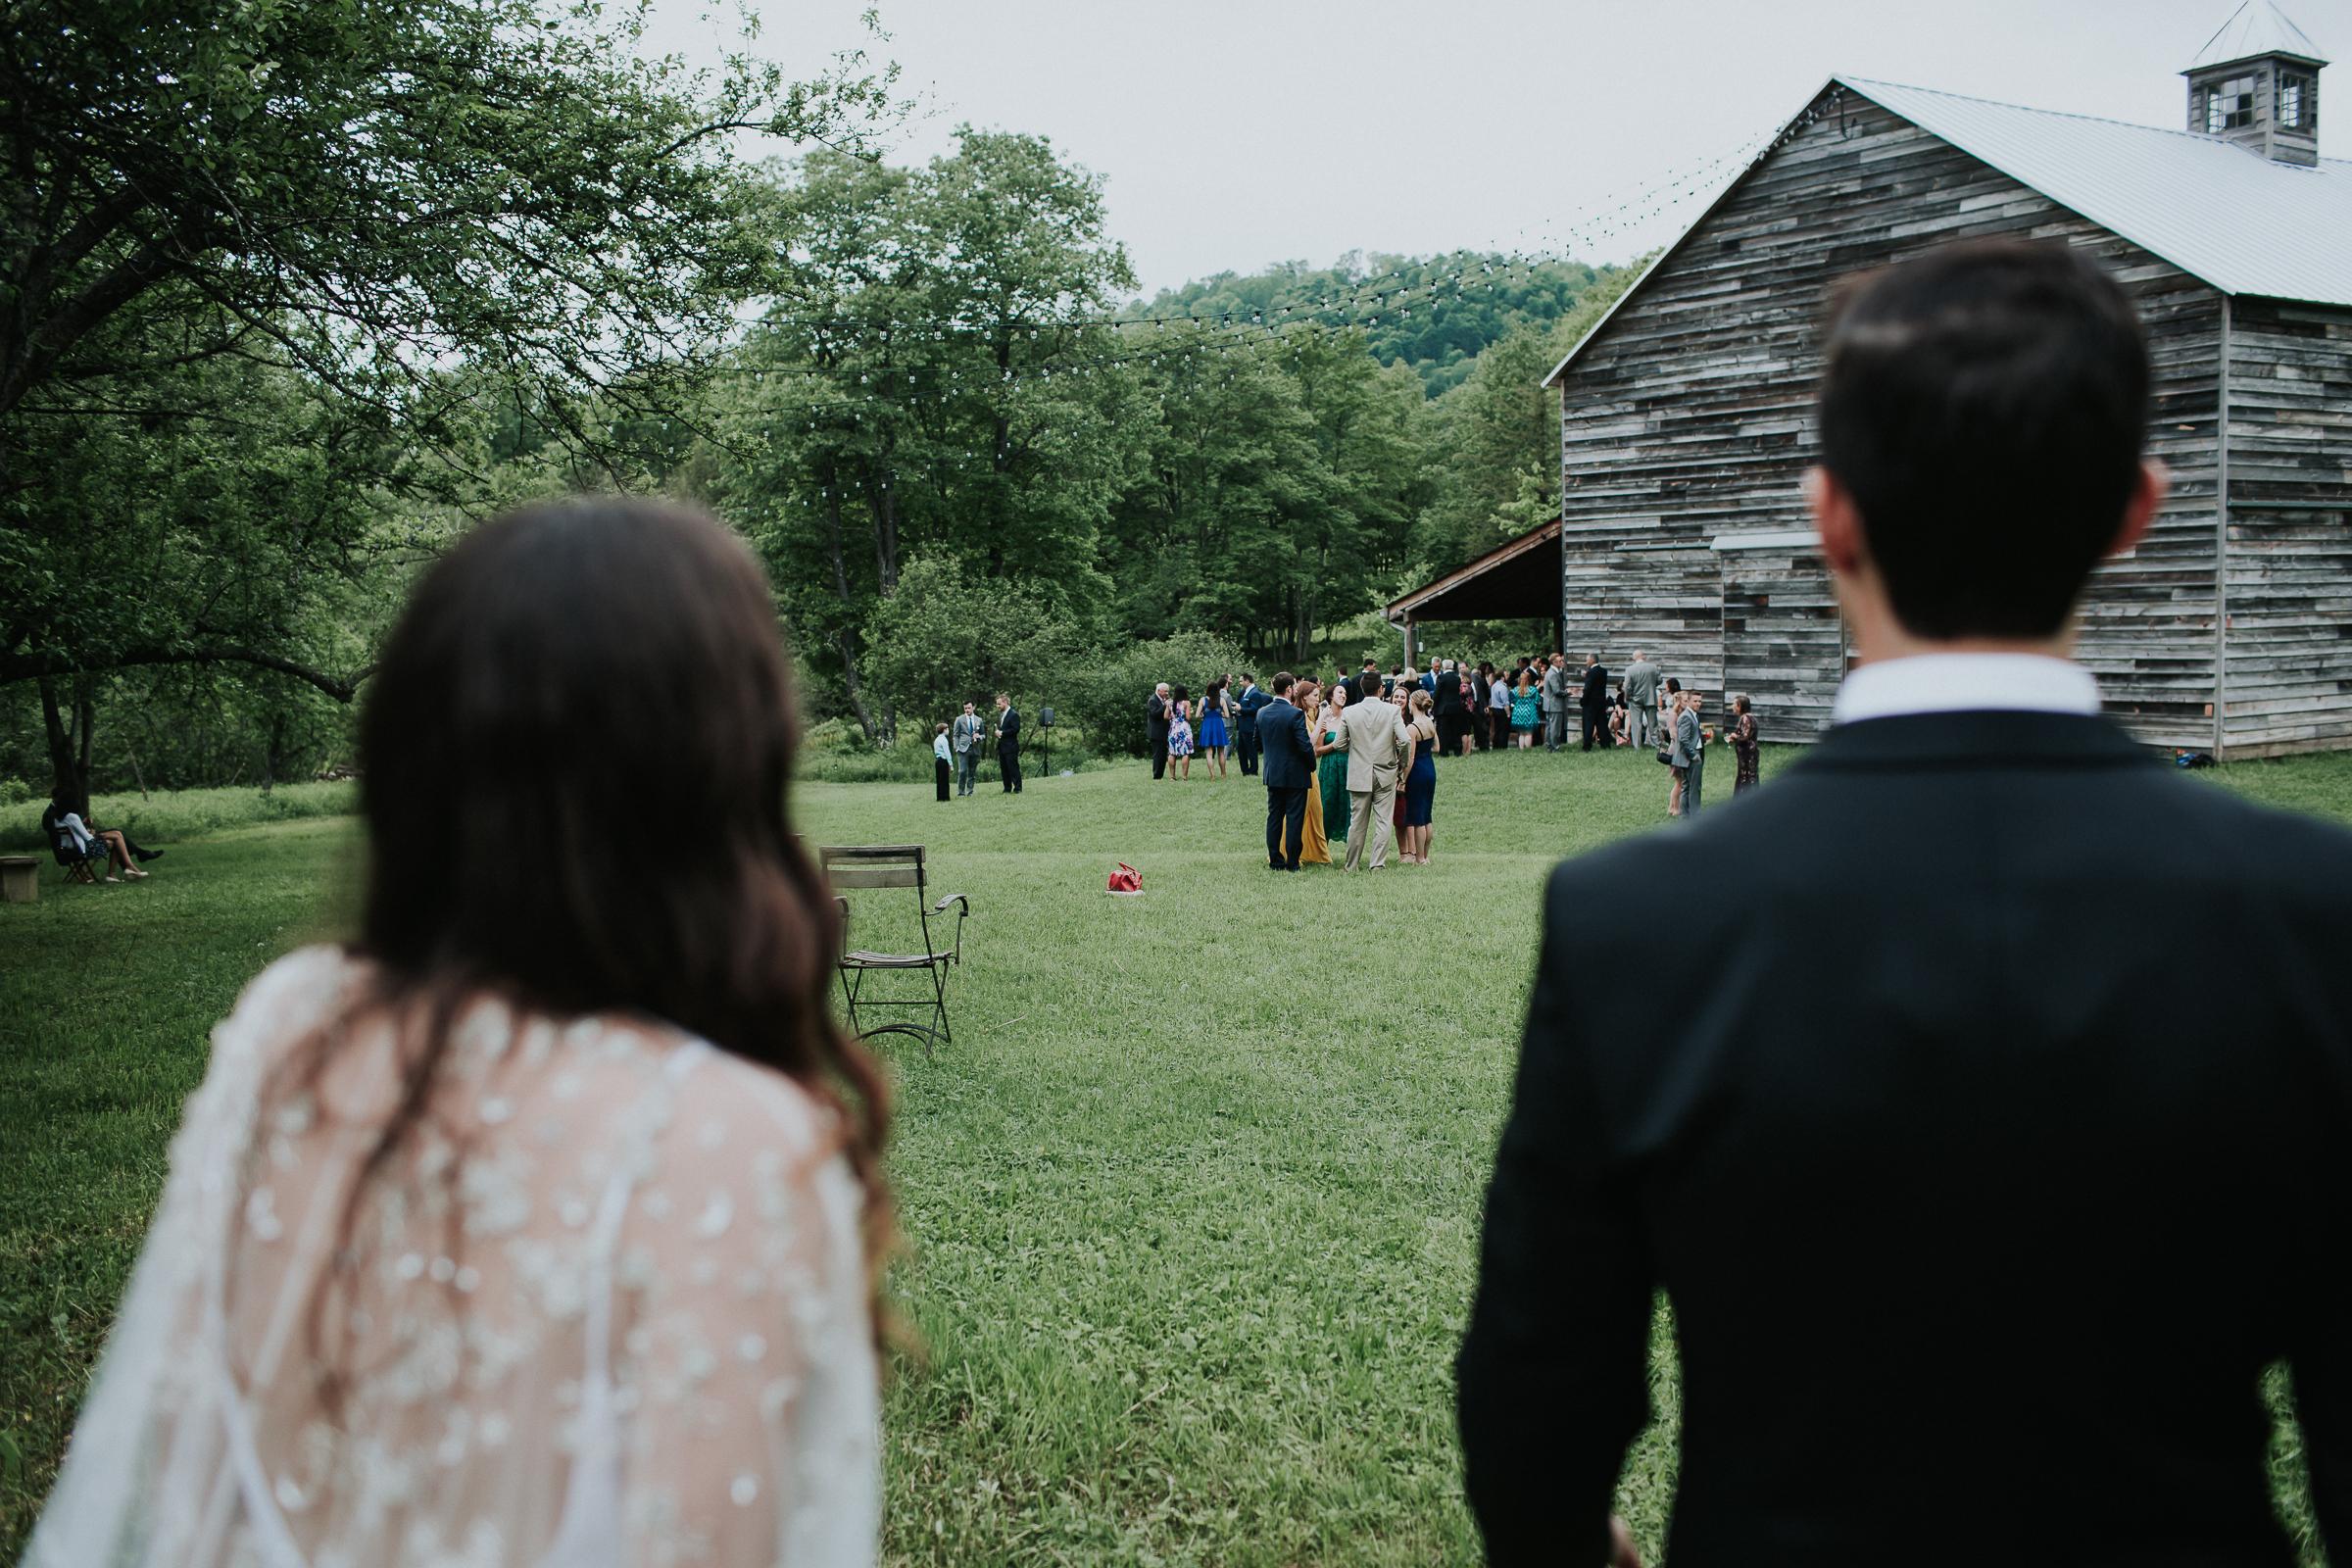 Handsome-Hollow-Long-Eddy-Catskills-New-York-Fine-Art-Documentary-Wedding-Photographer-94.jpg